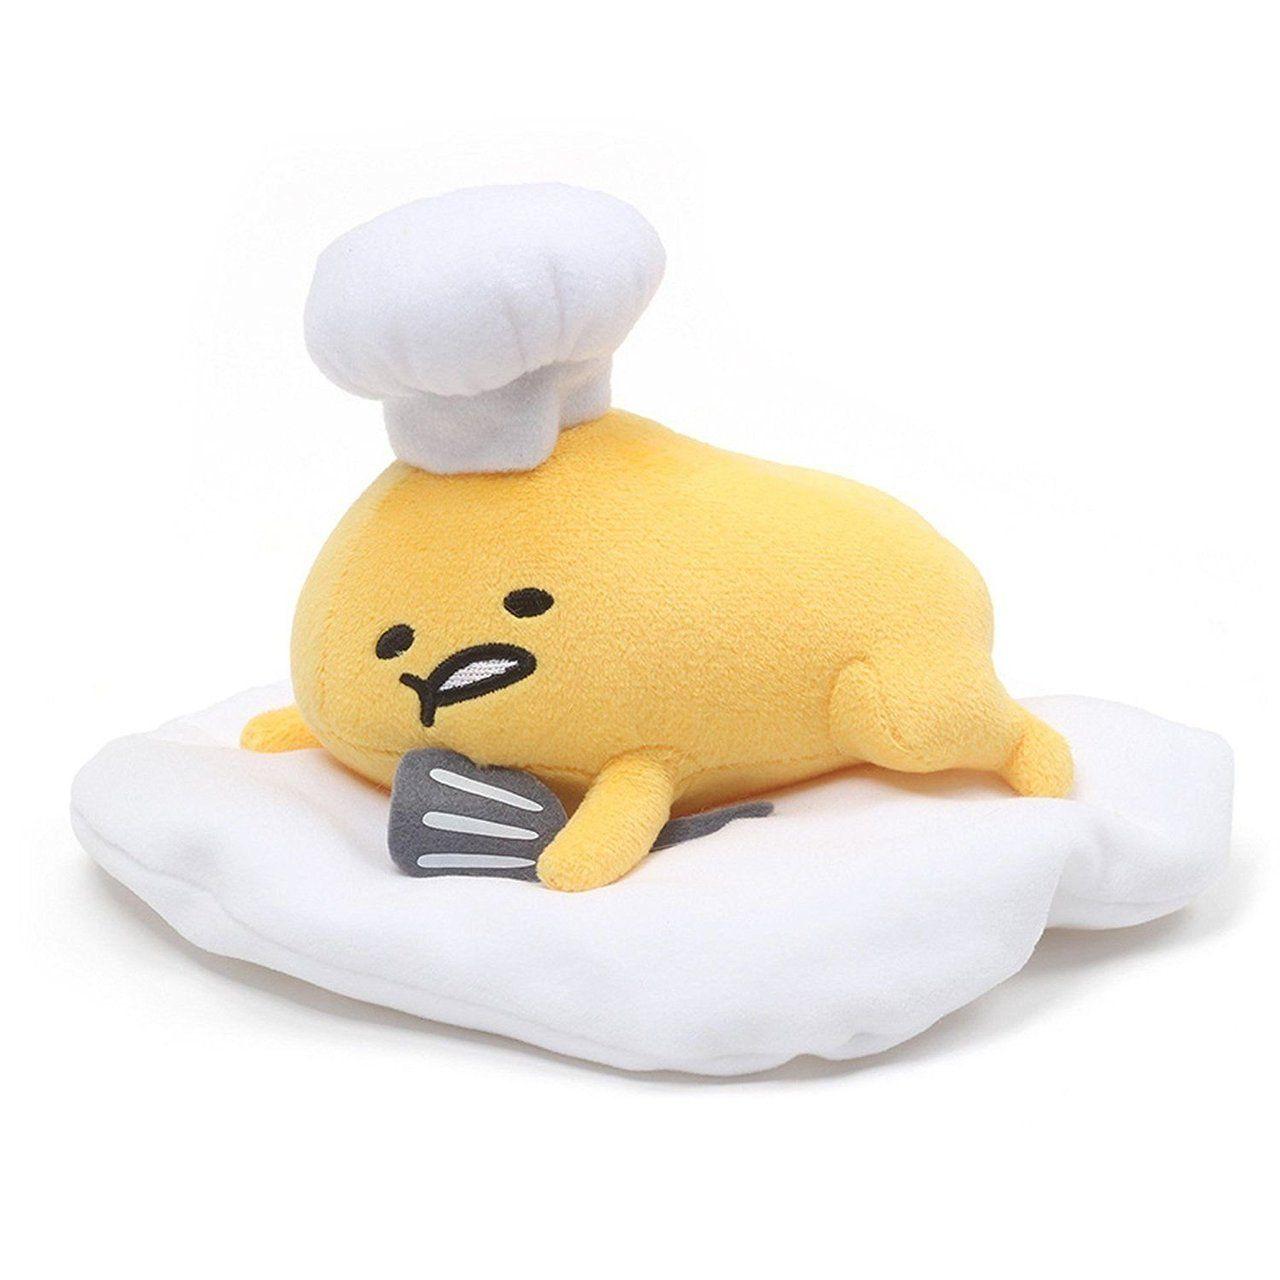 Lazy Egg Plush Toy Lucu